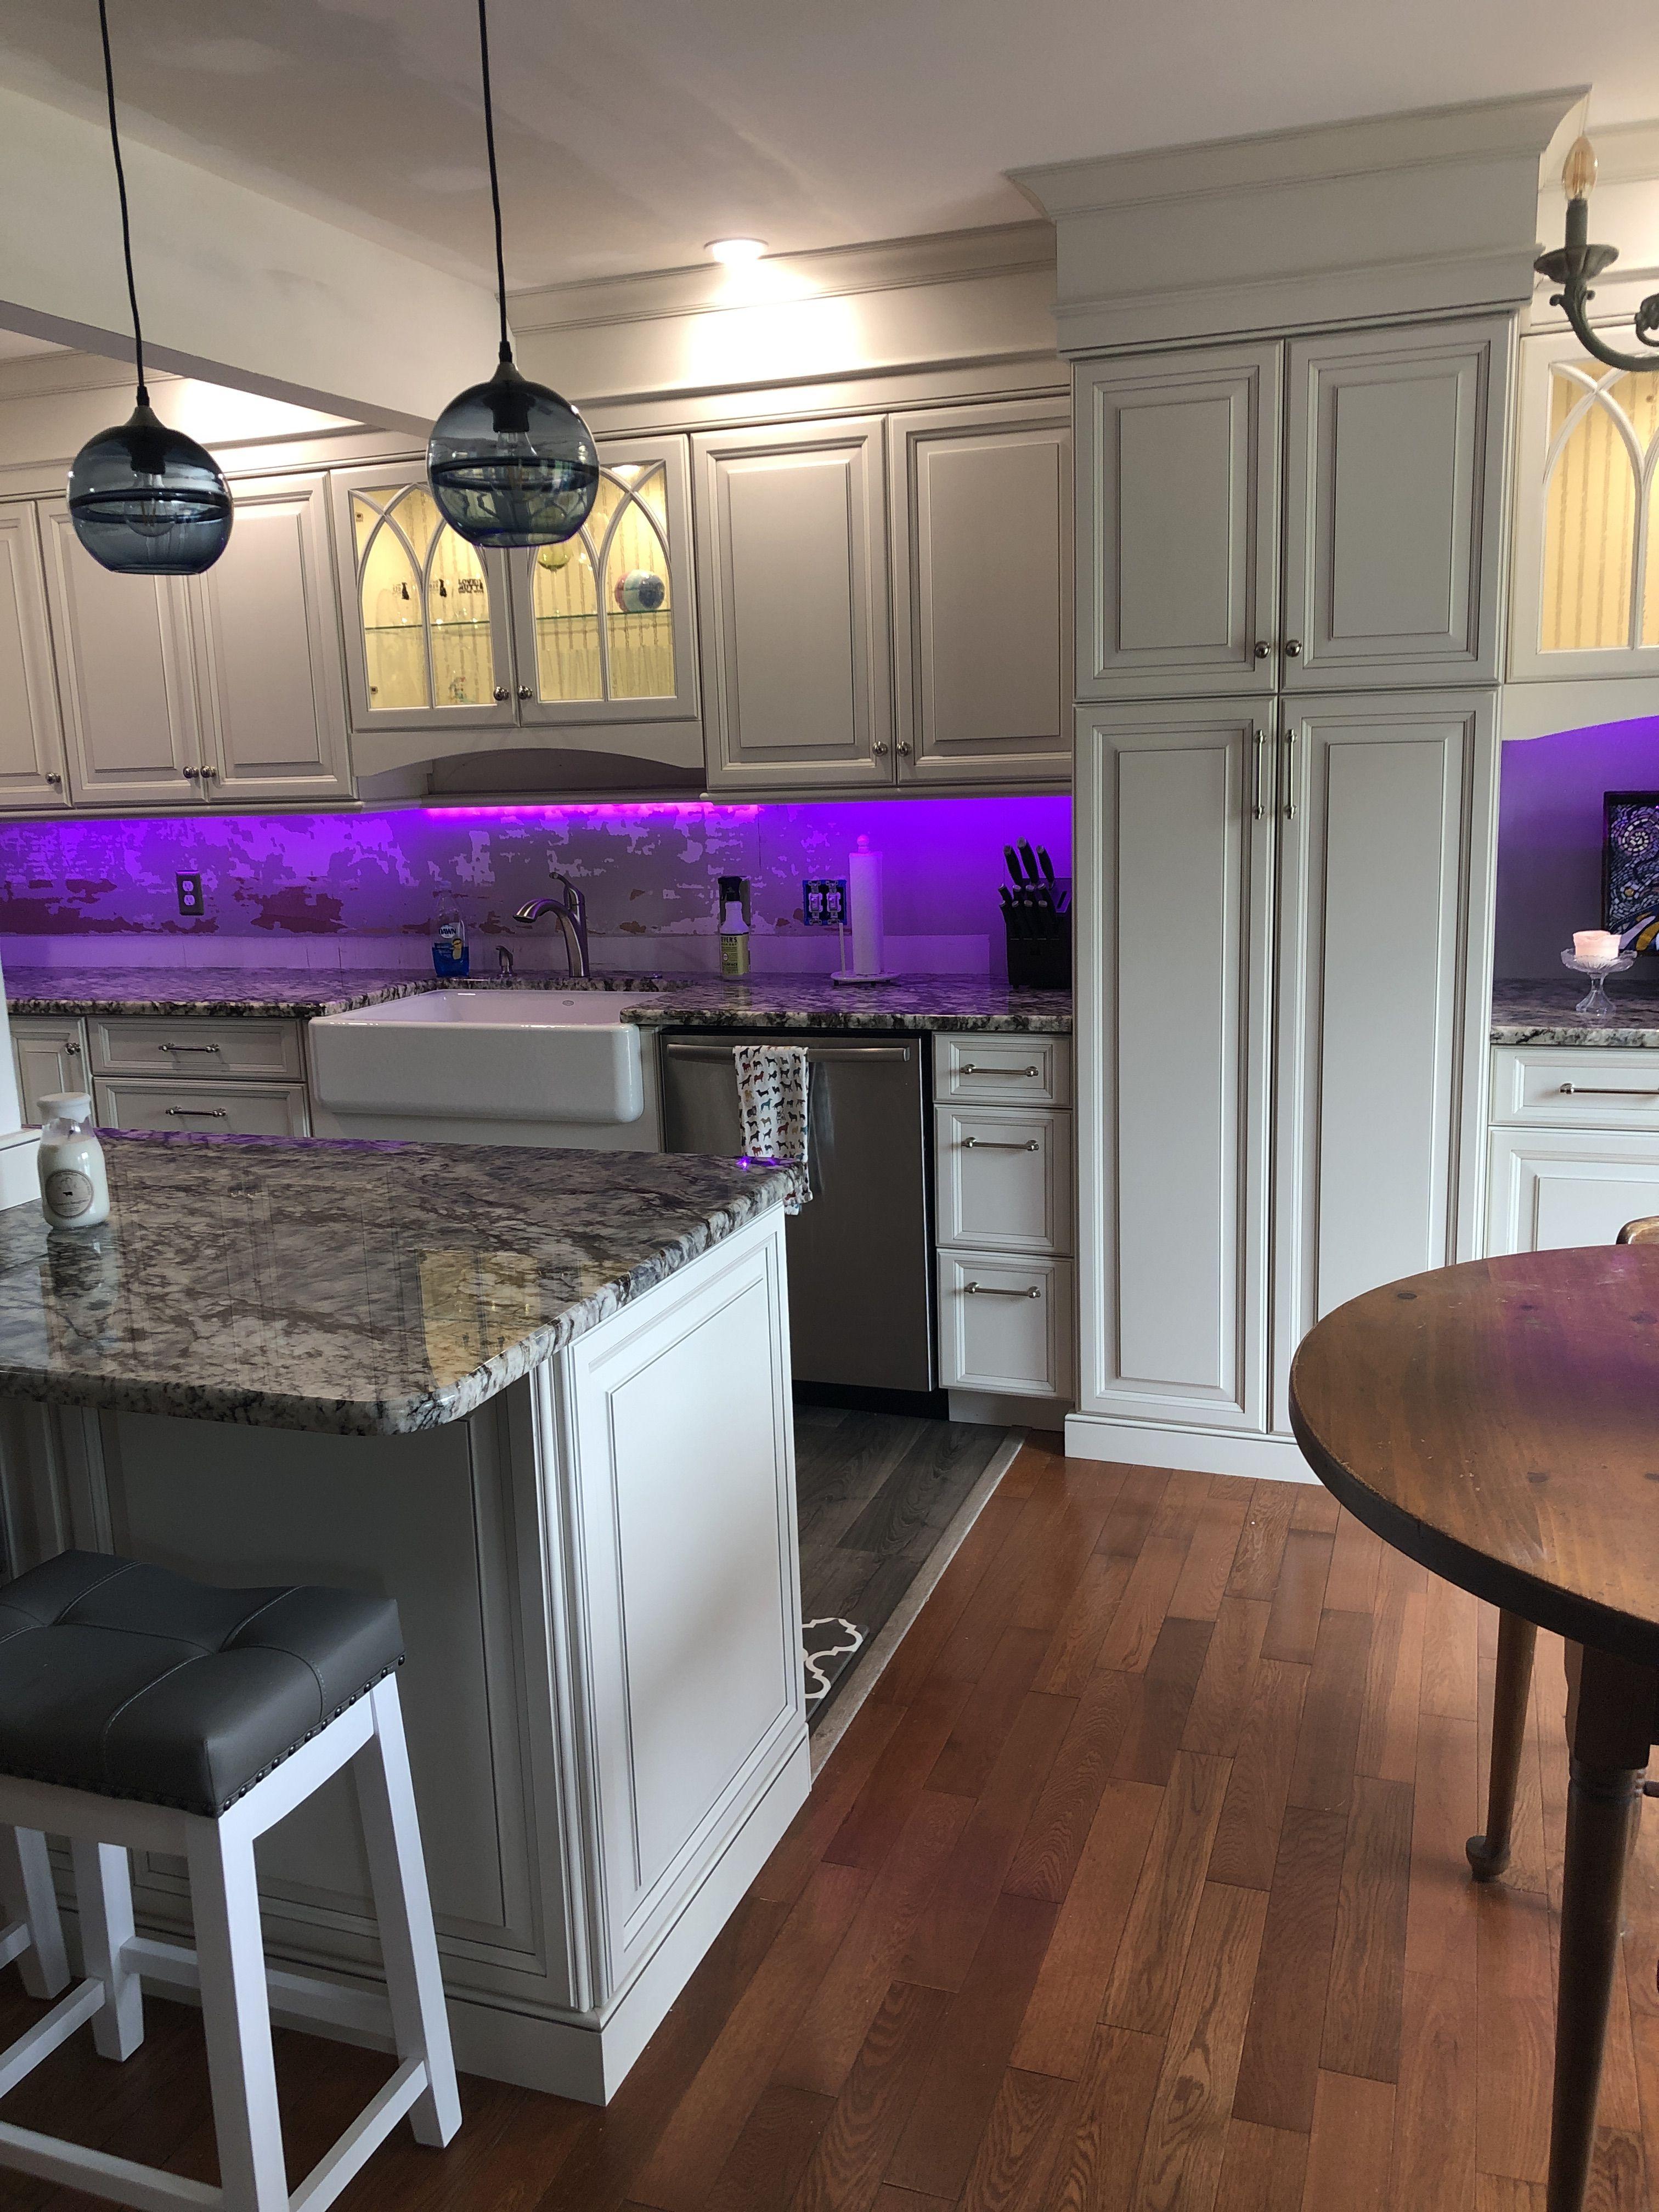 Purple | Kitchen cabinets, Kitchen, Home decor